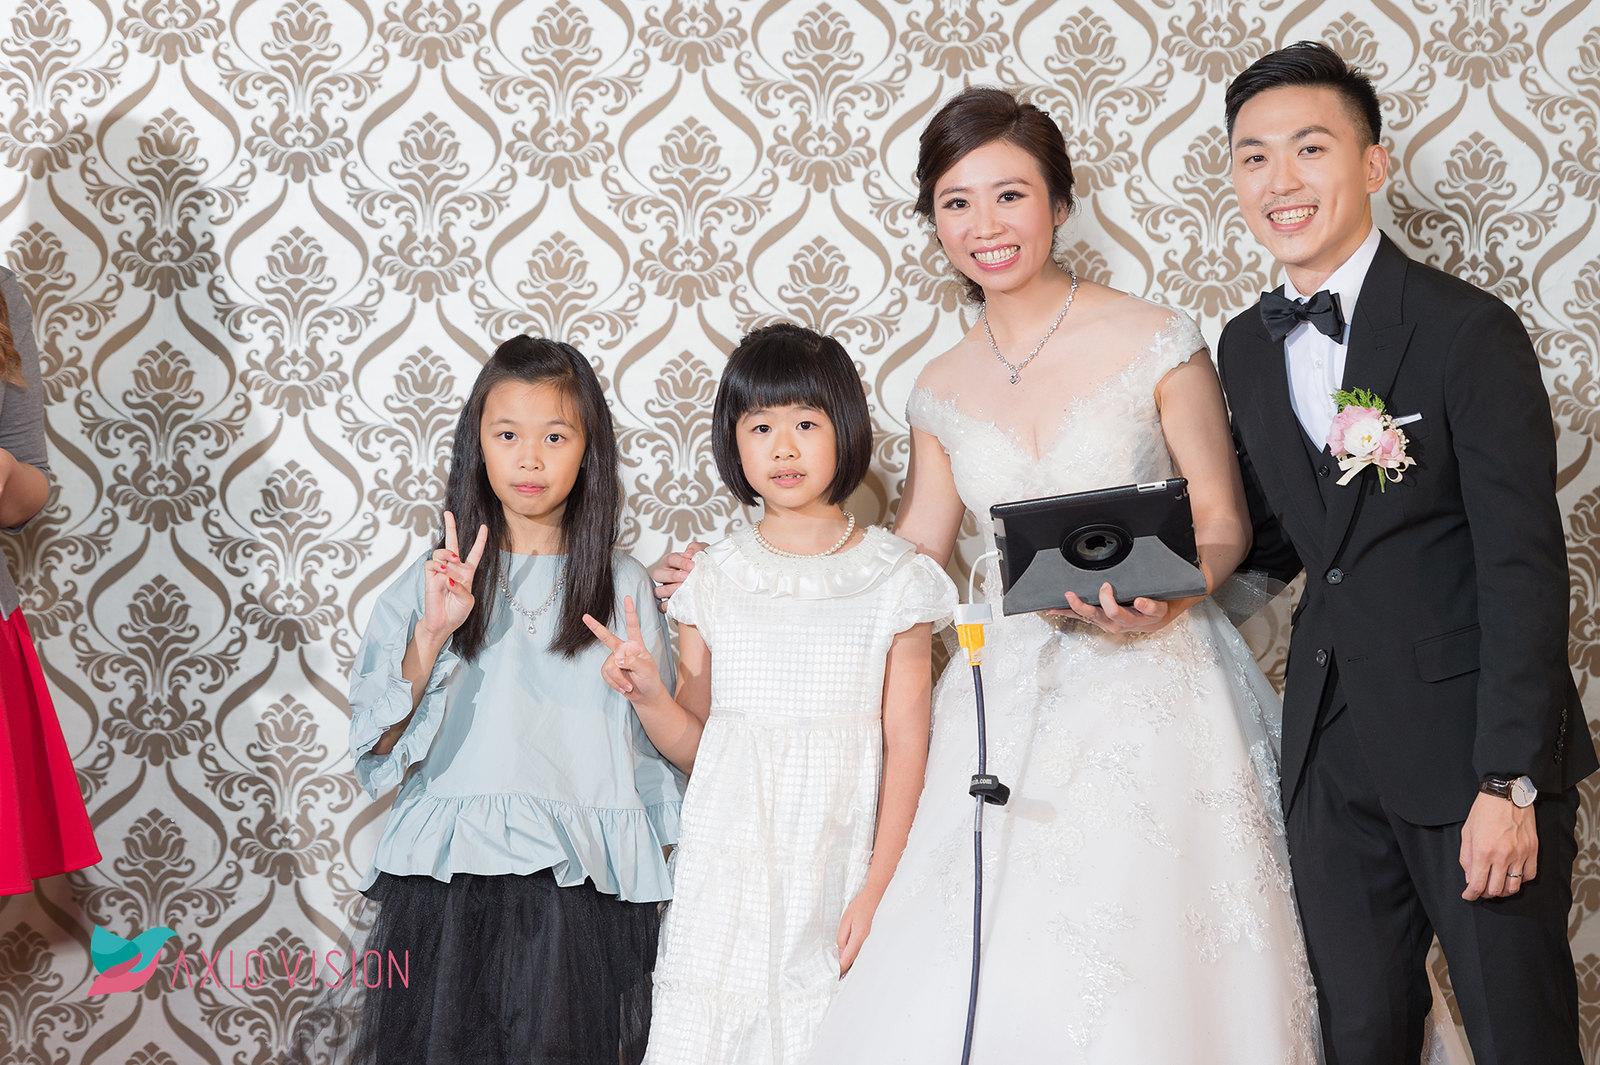 20170916 WeddingDay_155